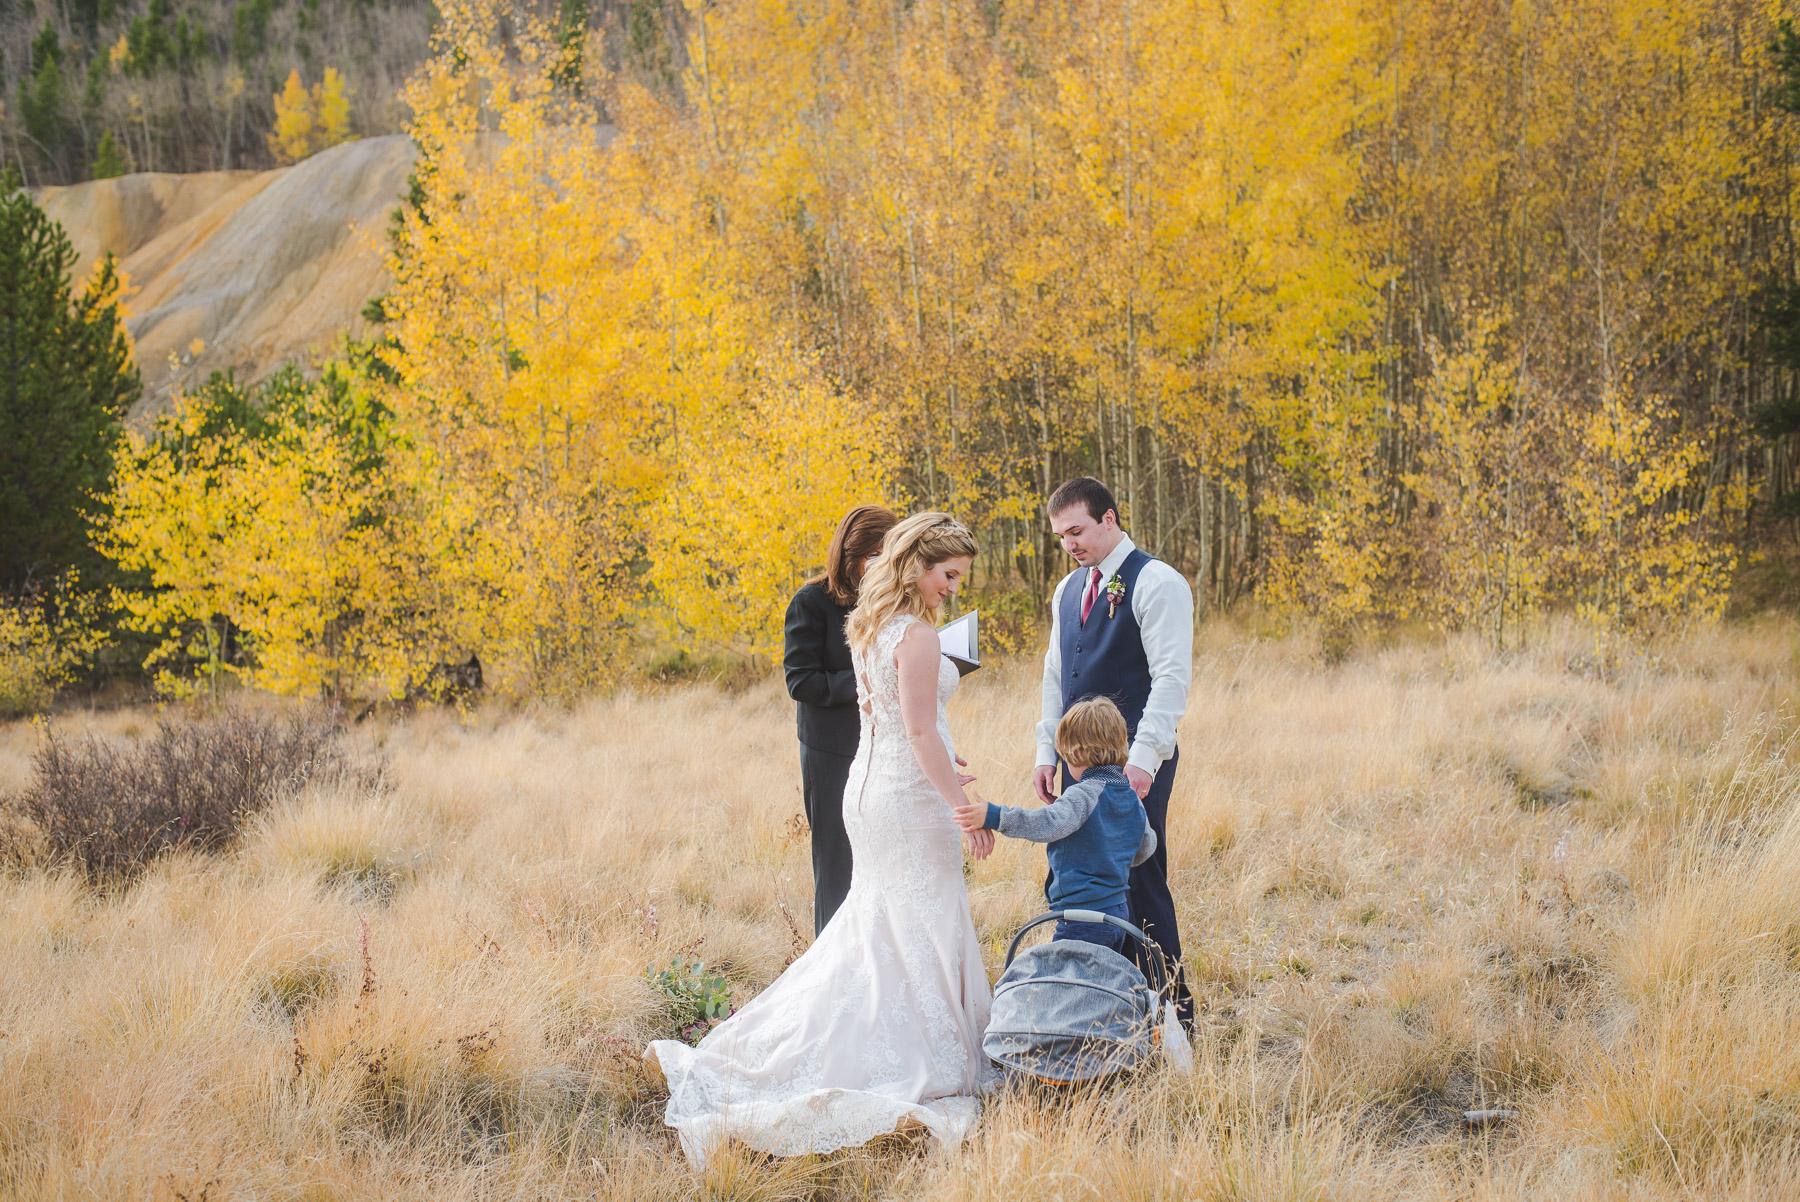 Autumn elopement in Breckenridge, Colorado | Two young boys | Summit Mountain Weddings